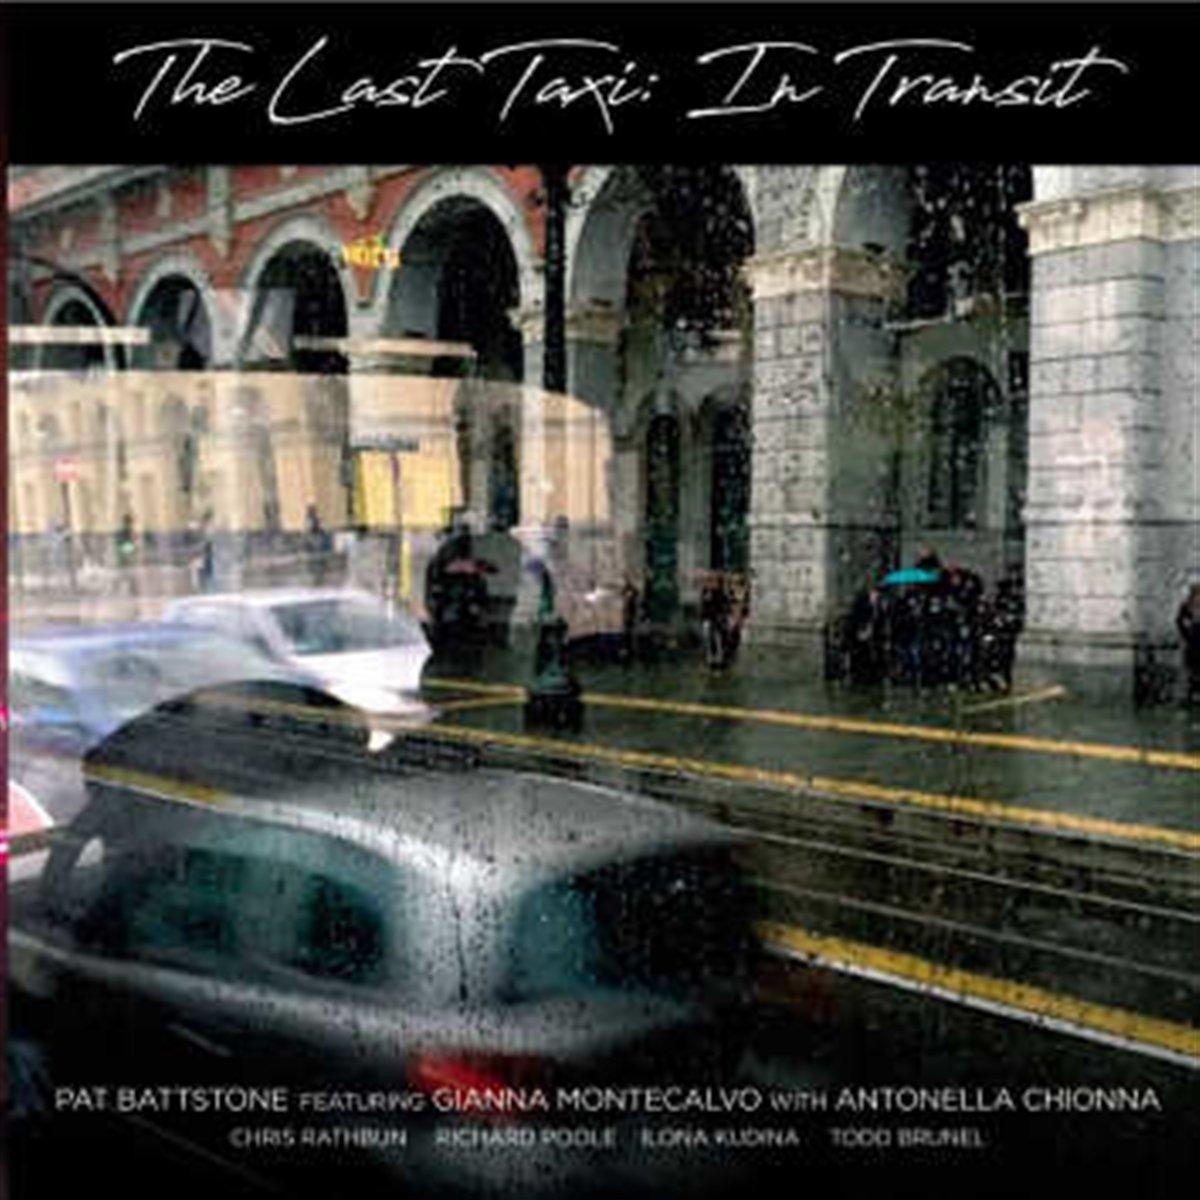 CD : Pat Battstone - Last Taxi: In Transit (Spain - Import)